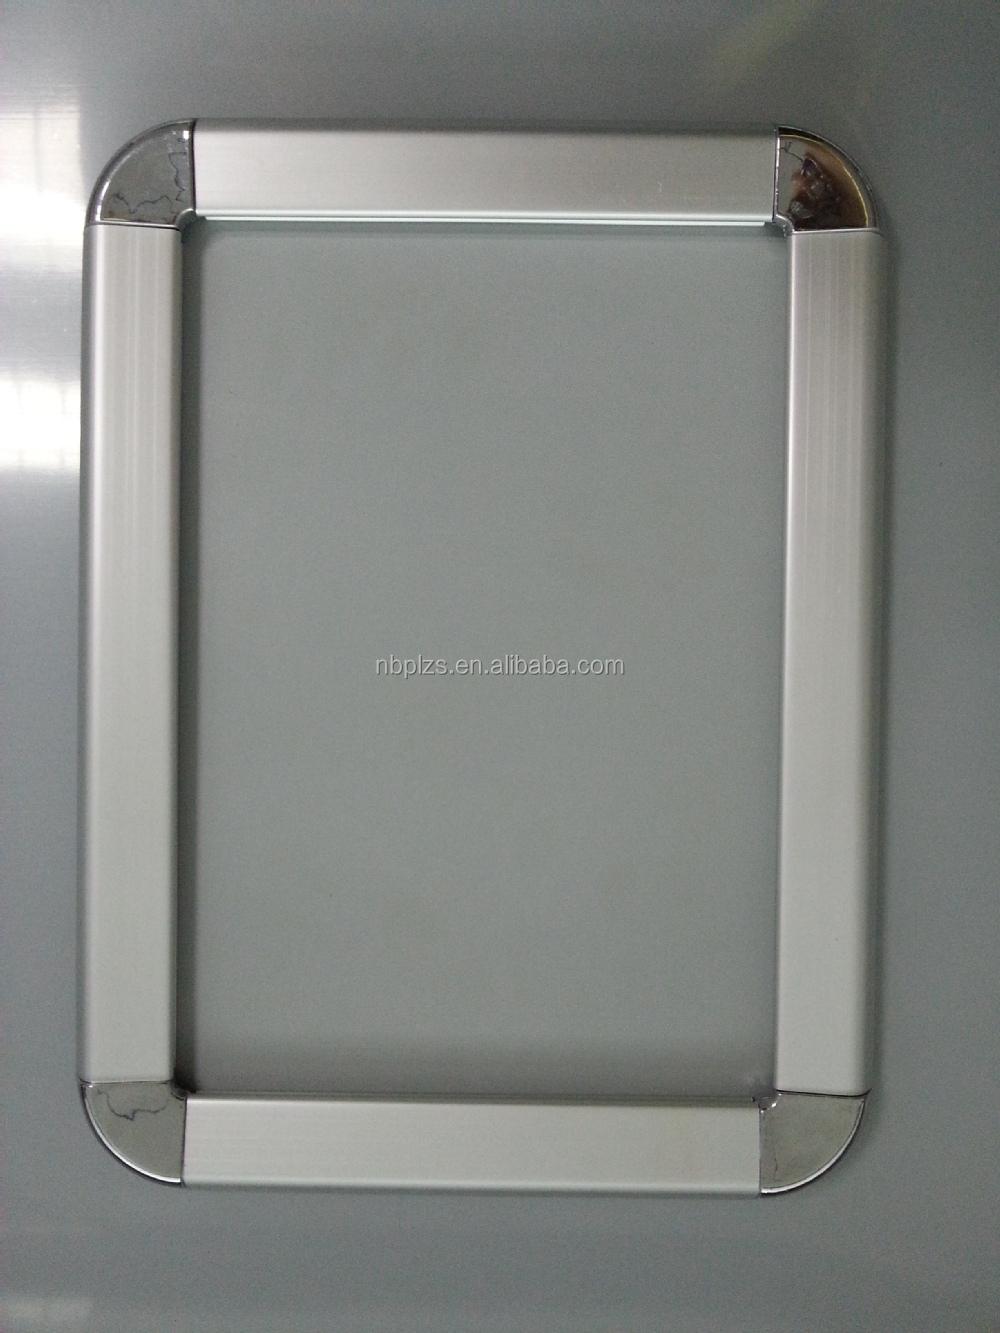 High Quality Aluminum Profile Snap Frames Round Corner Poster Frames ...